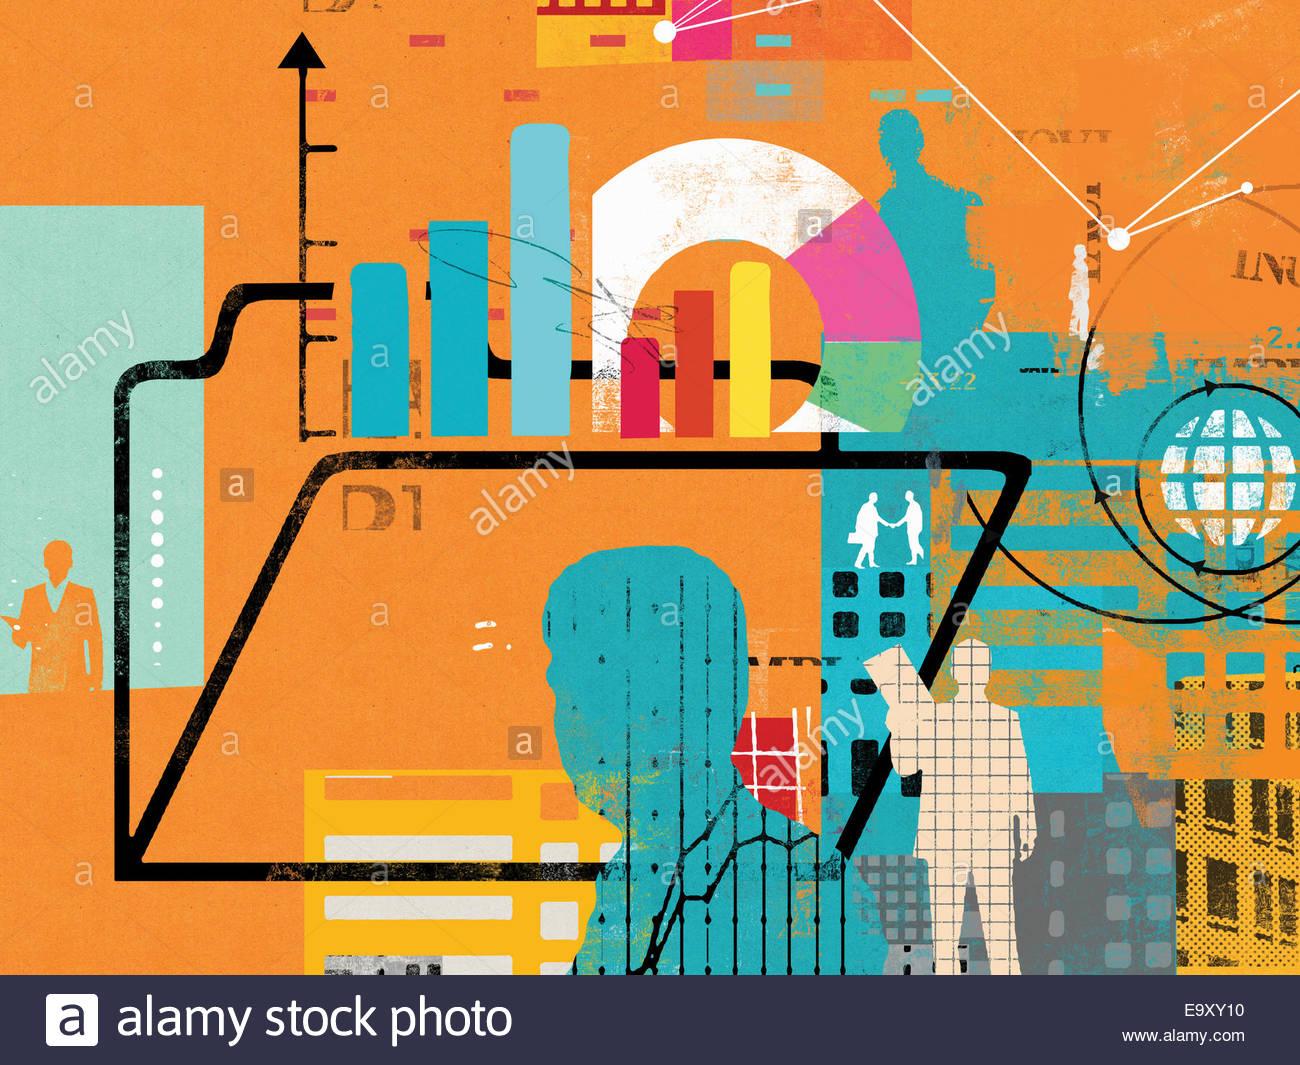 Businessmen, globe, financial data and folder - Stock Image